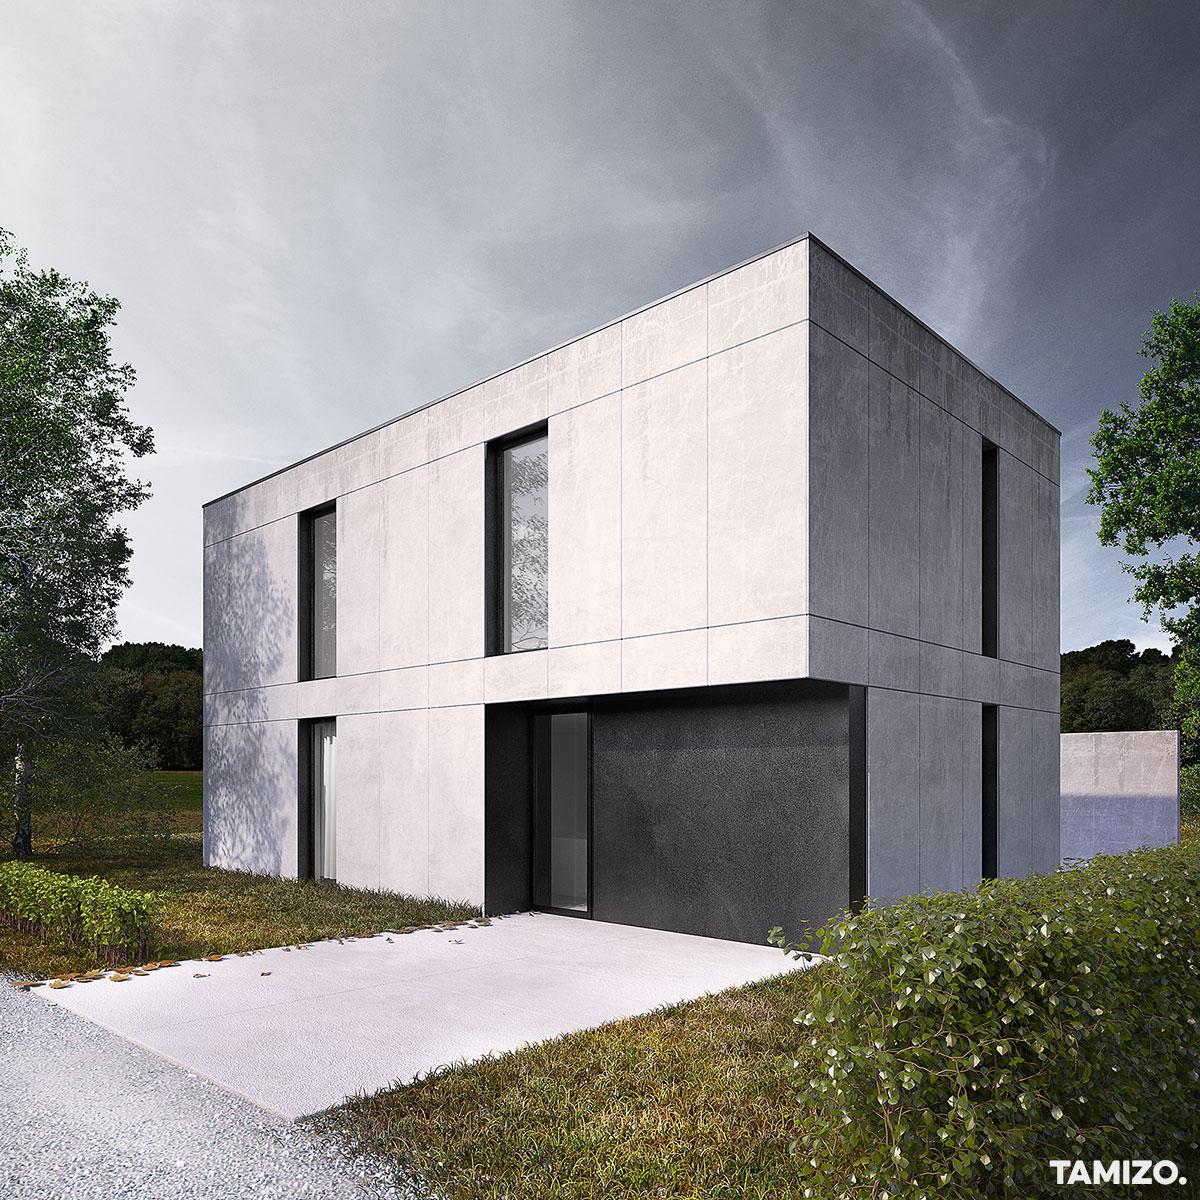 A063_tamizo_architects_mateusz_kuo_stolarski_dom_projekt_wojtka_pabianice_maly_domek_01